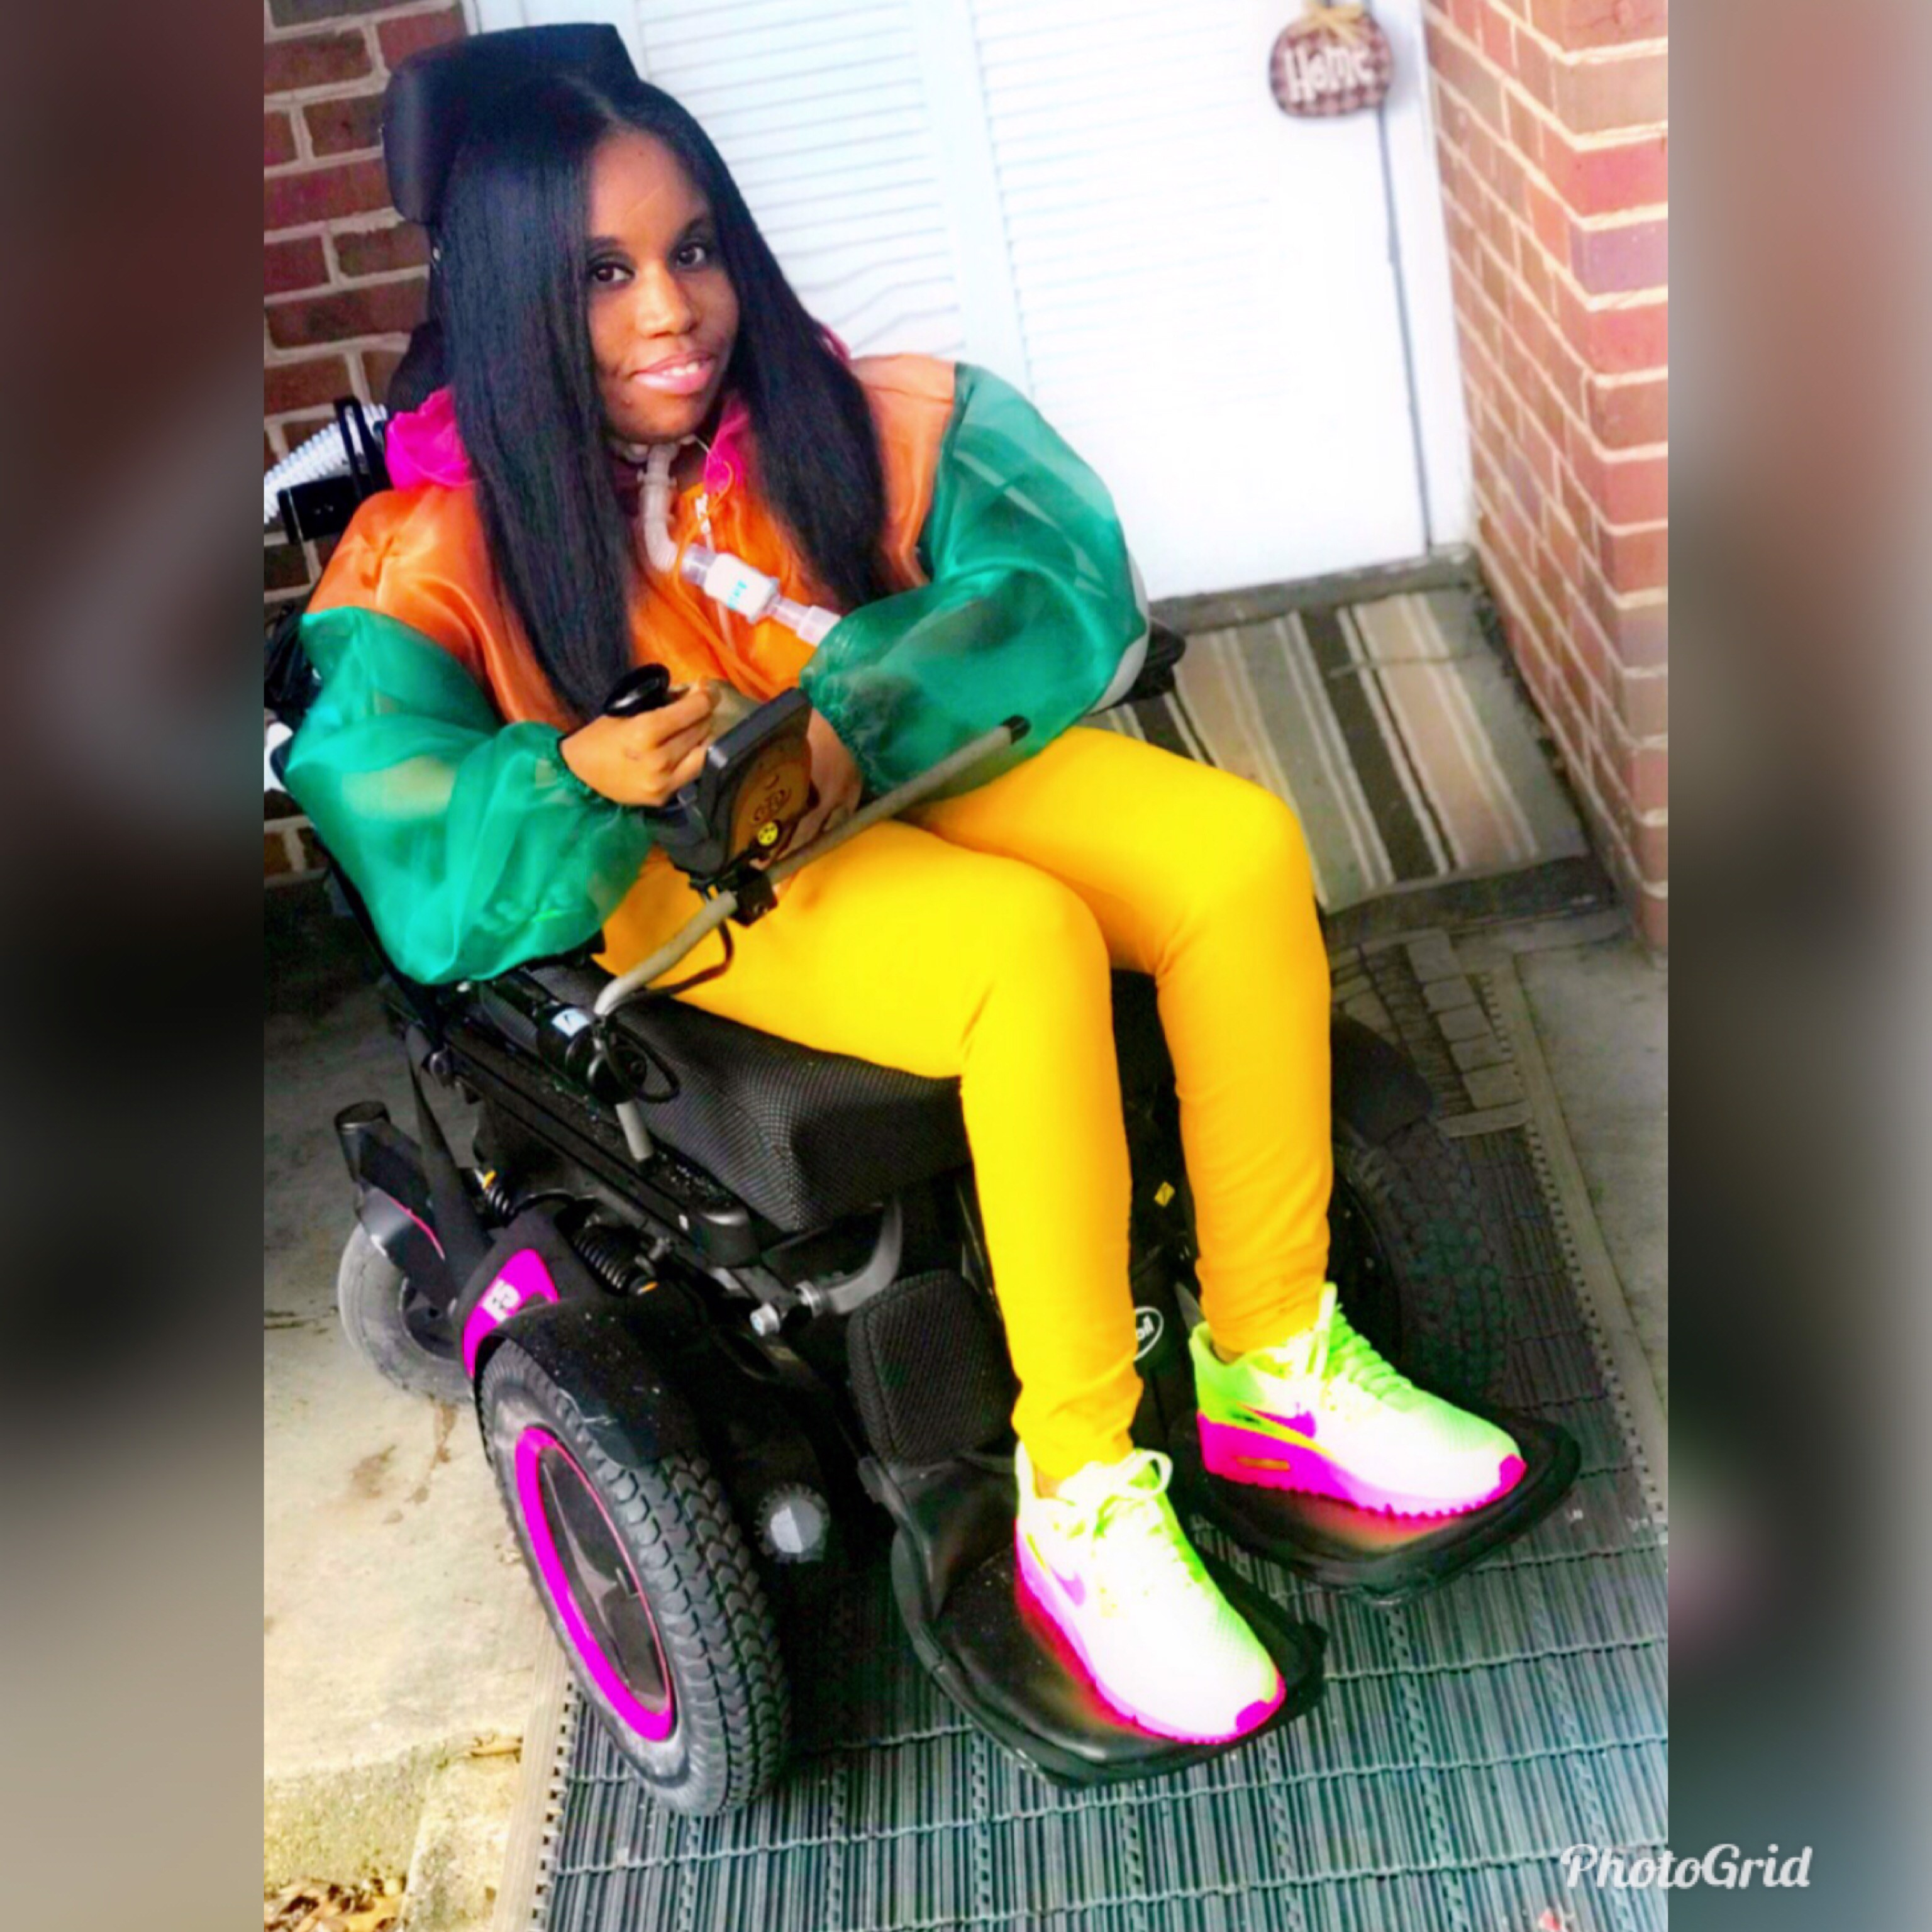 Fine Yoocan Janiqua Williams My Pretty Wheelchair Life With Download Free Architecture Designs Itiscsunscenecom